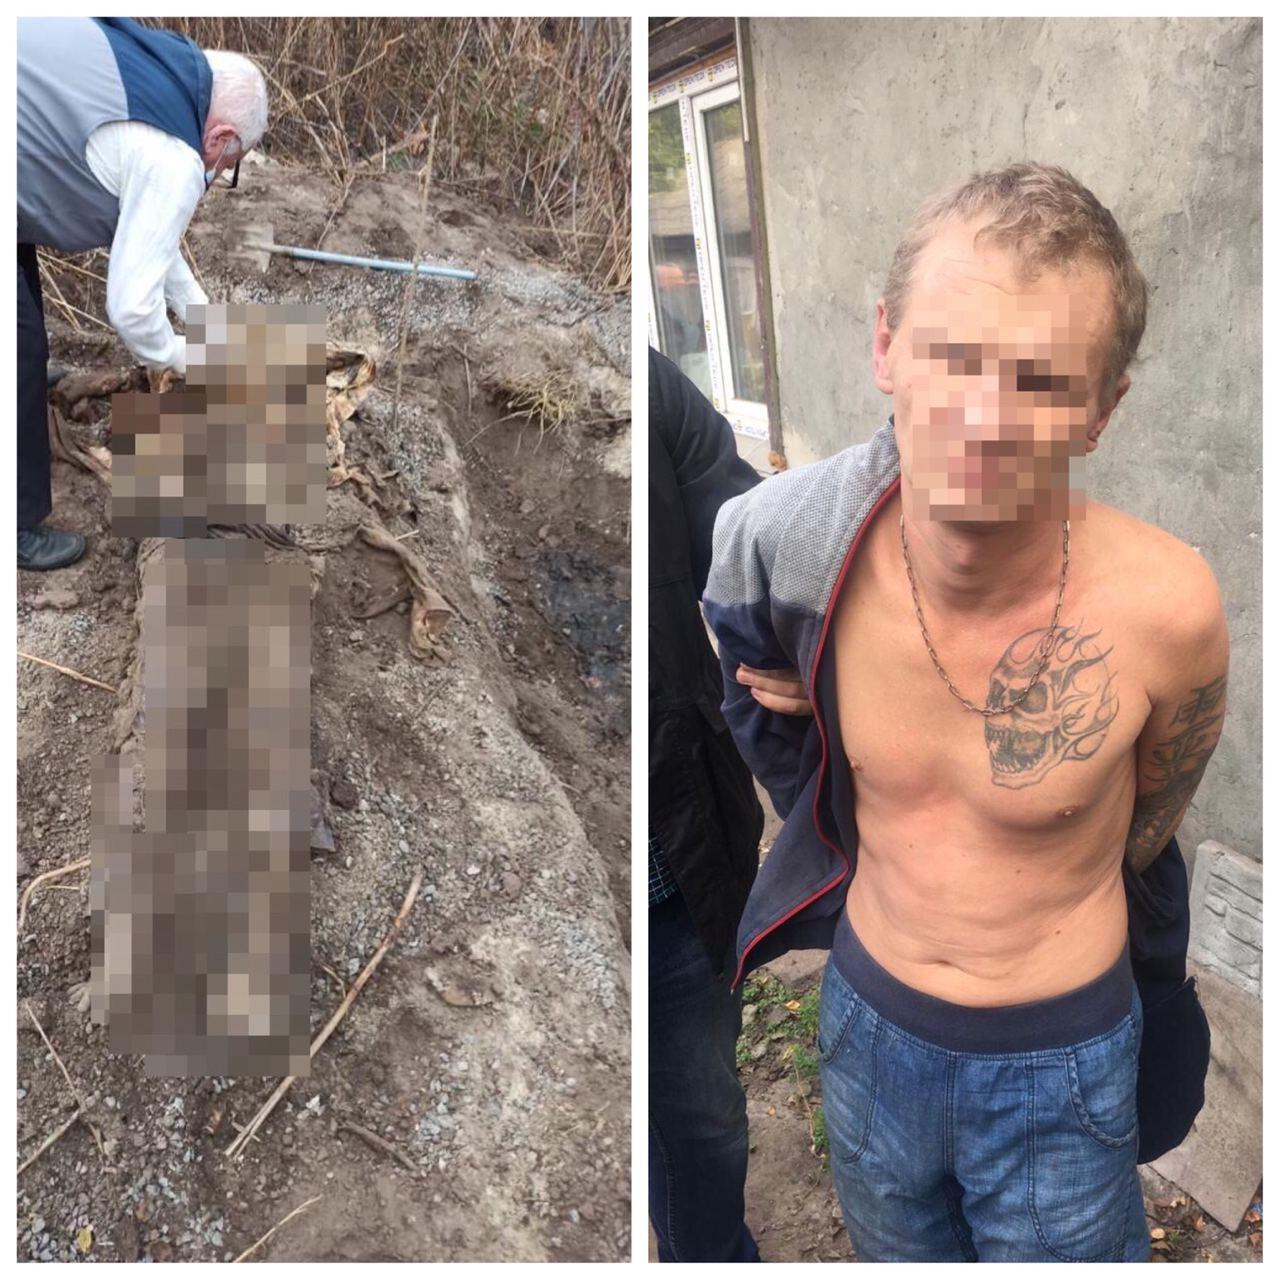 В Черкассах 37-летний мужчина убил и закопал во дворе своего знакомого